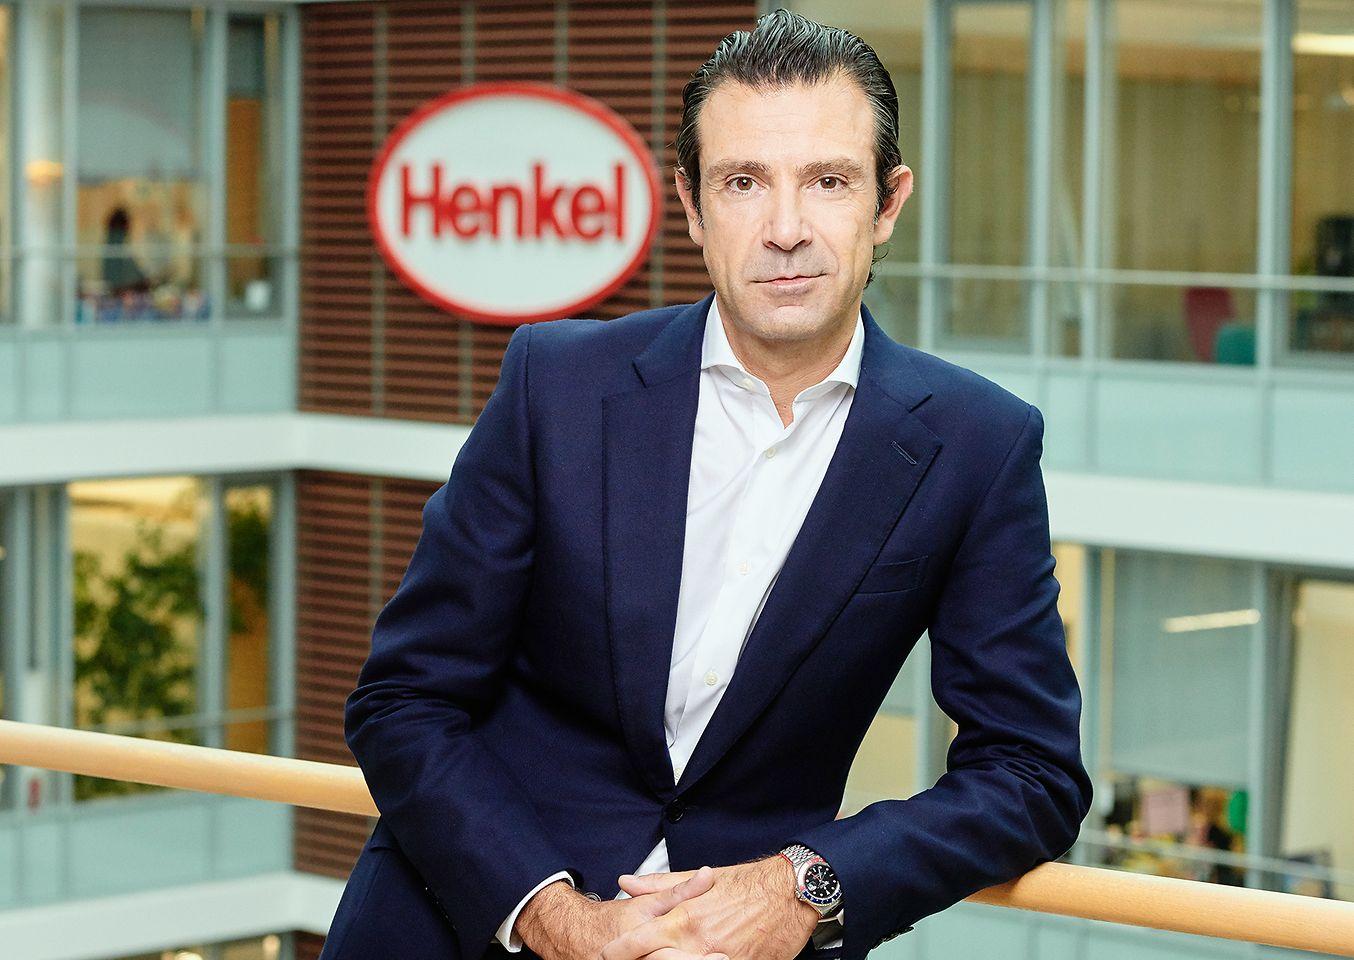 Rahmyn Kress, Chief Digital Officer at Henkel